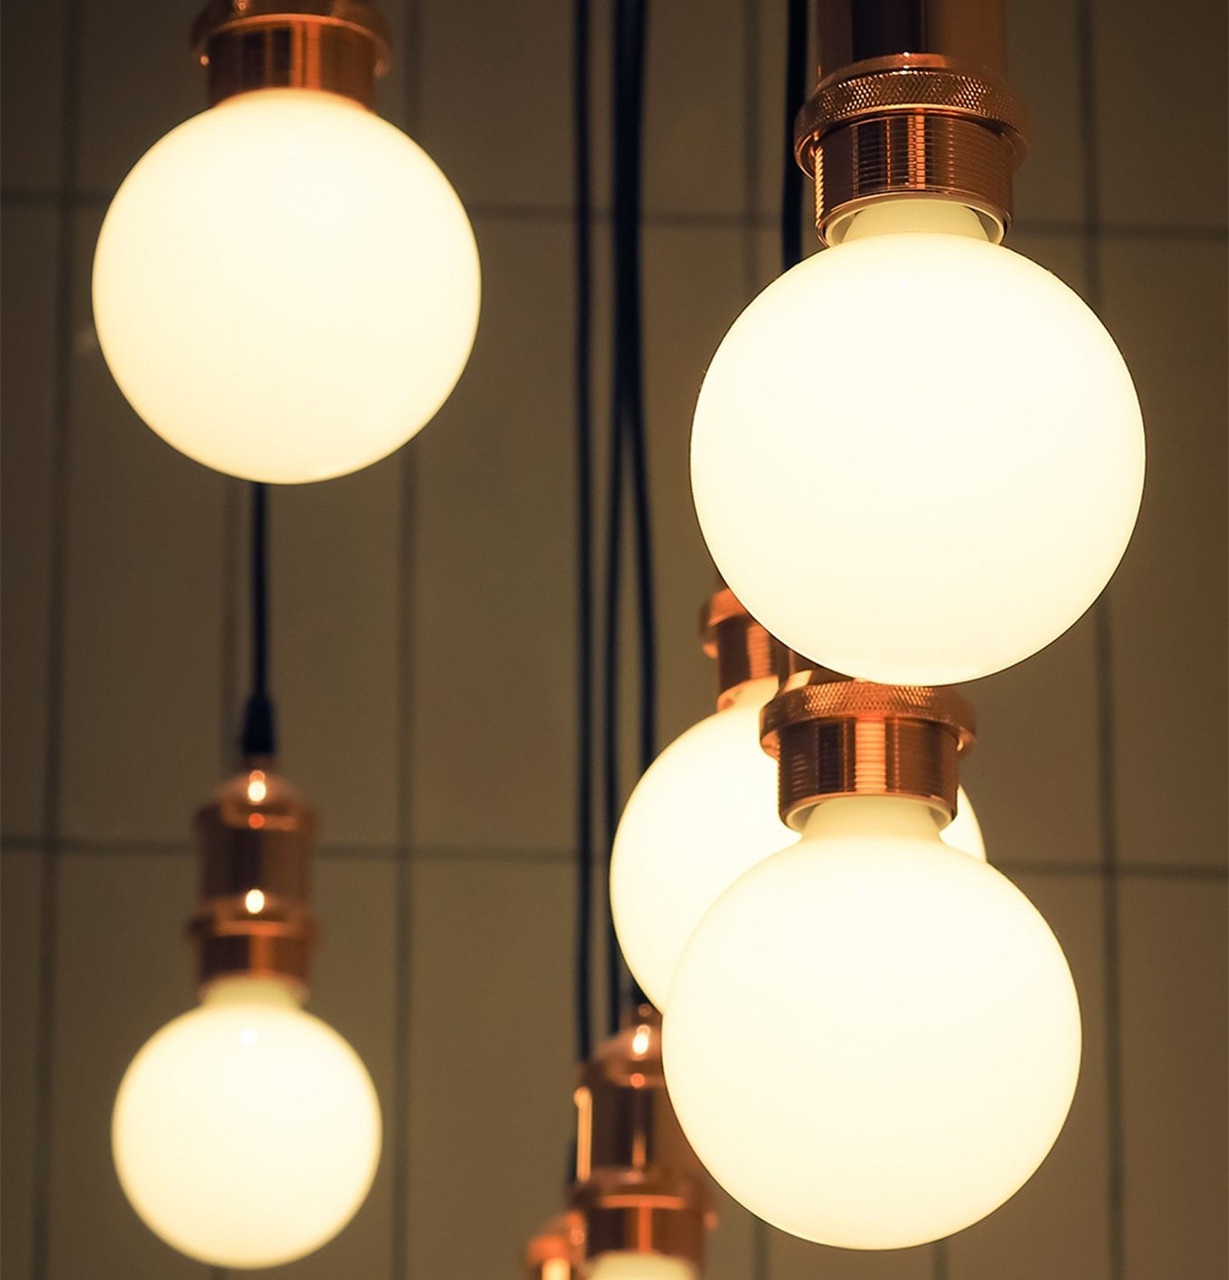 LED Globe Screw Light Bulbs